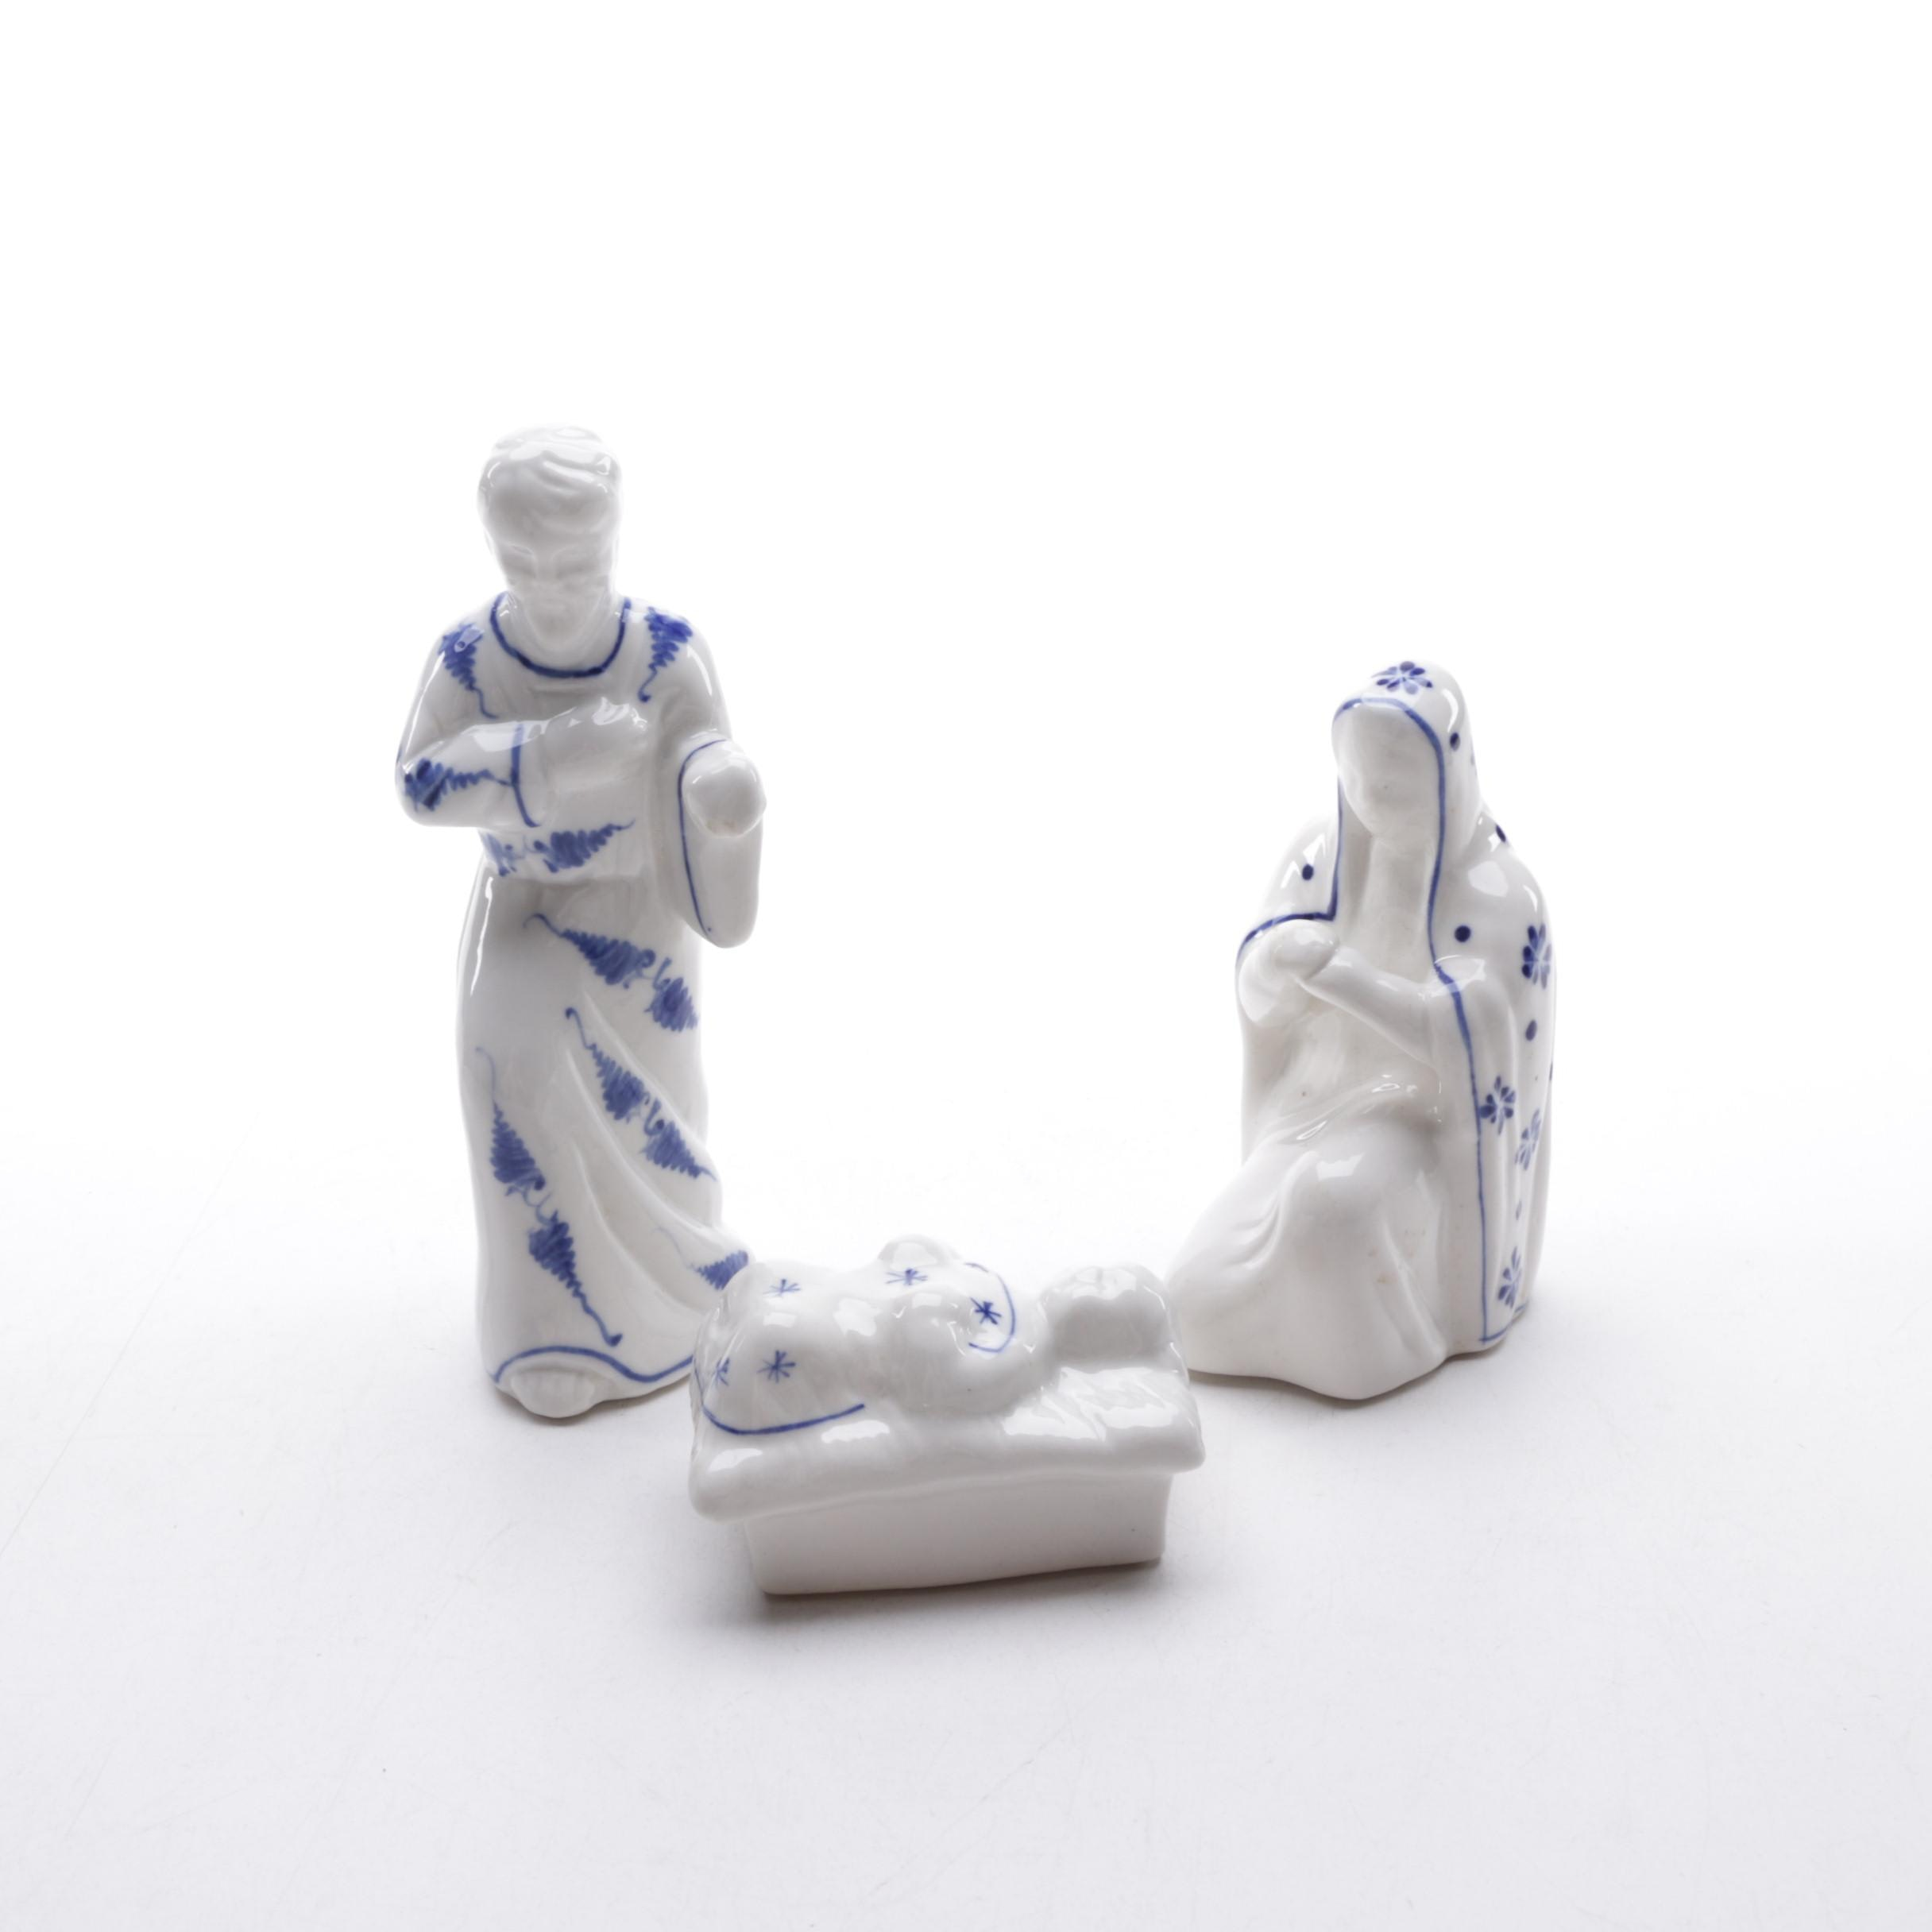 Ceramic Nativity Figurines